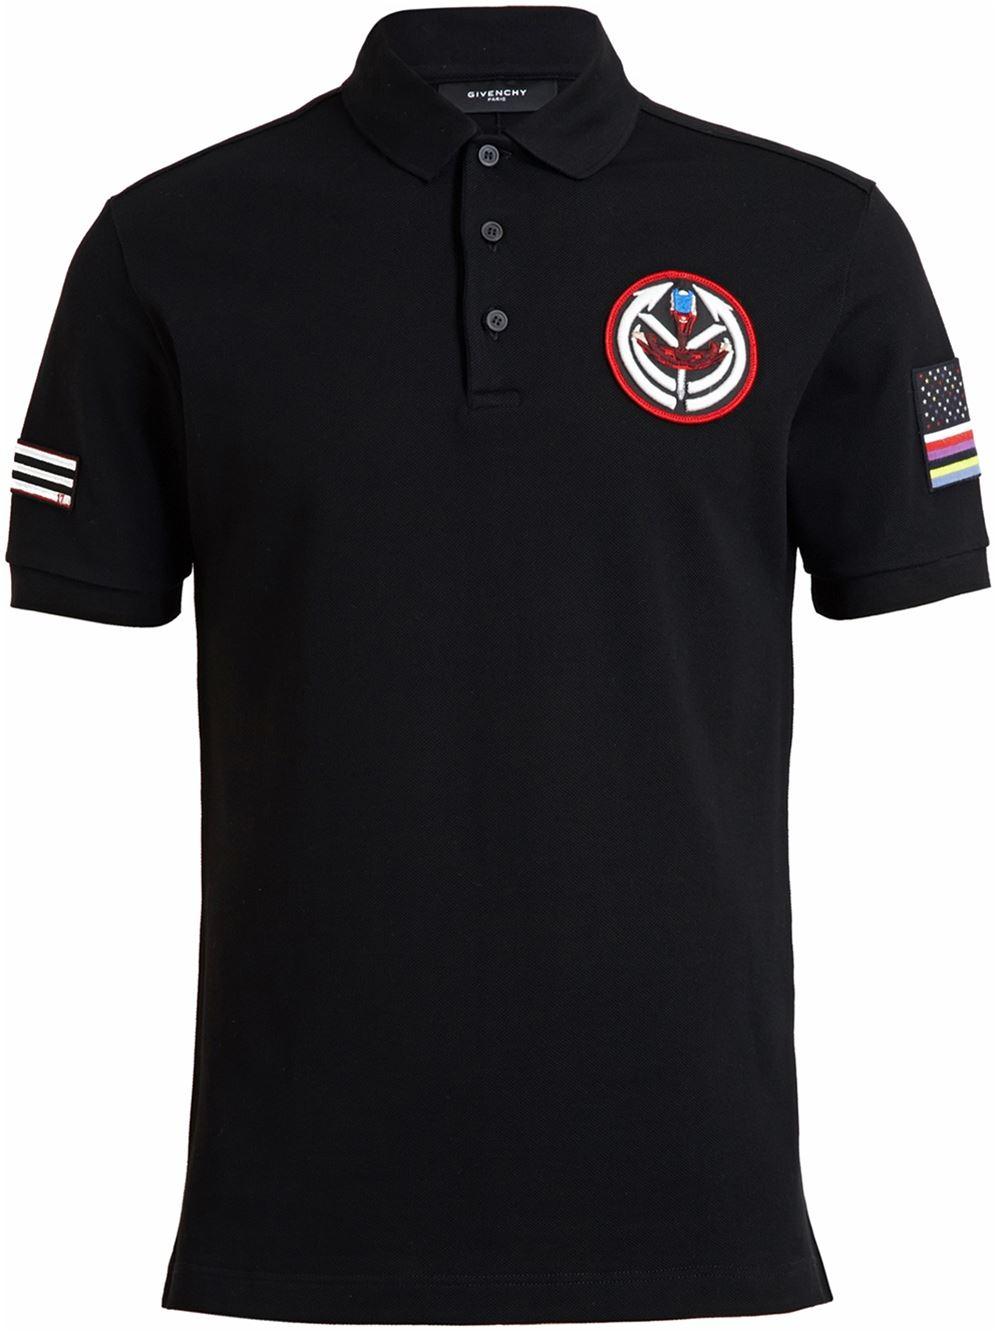 us flag uniform patch eBay